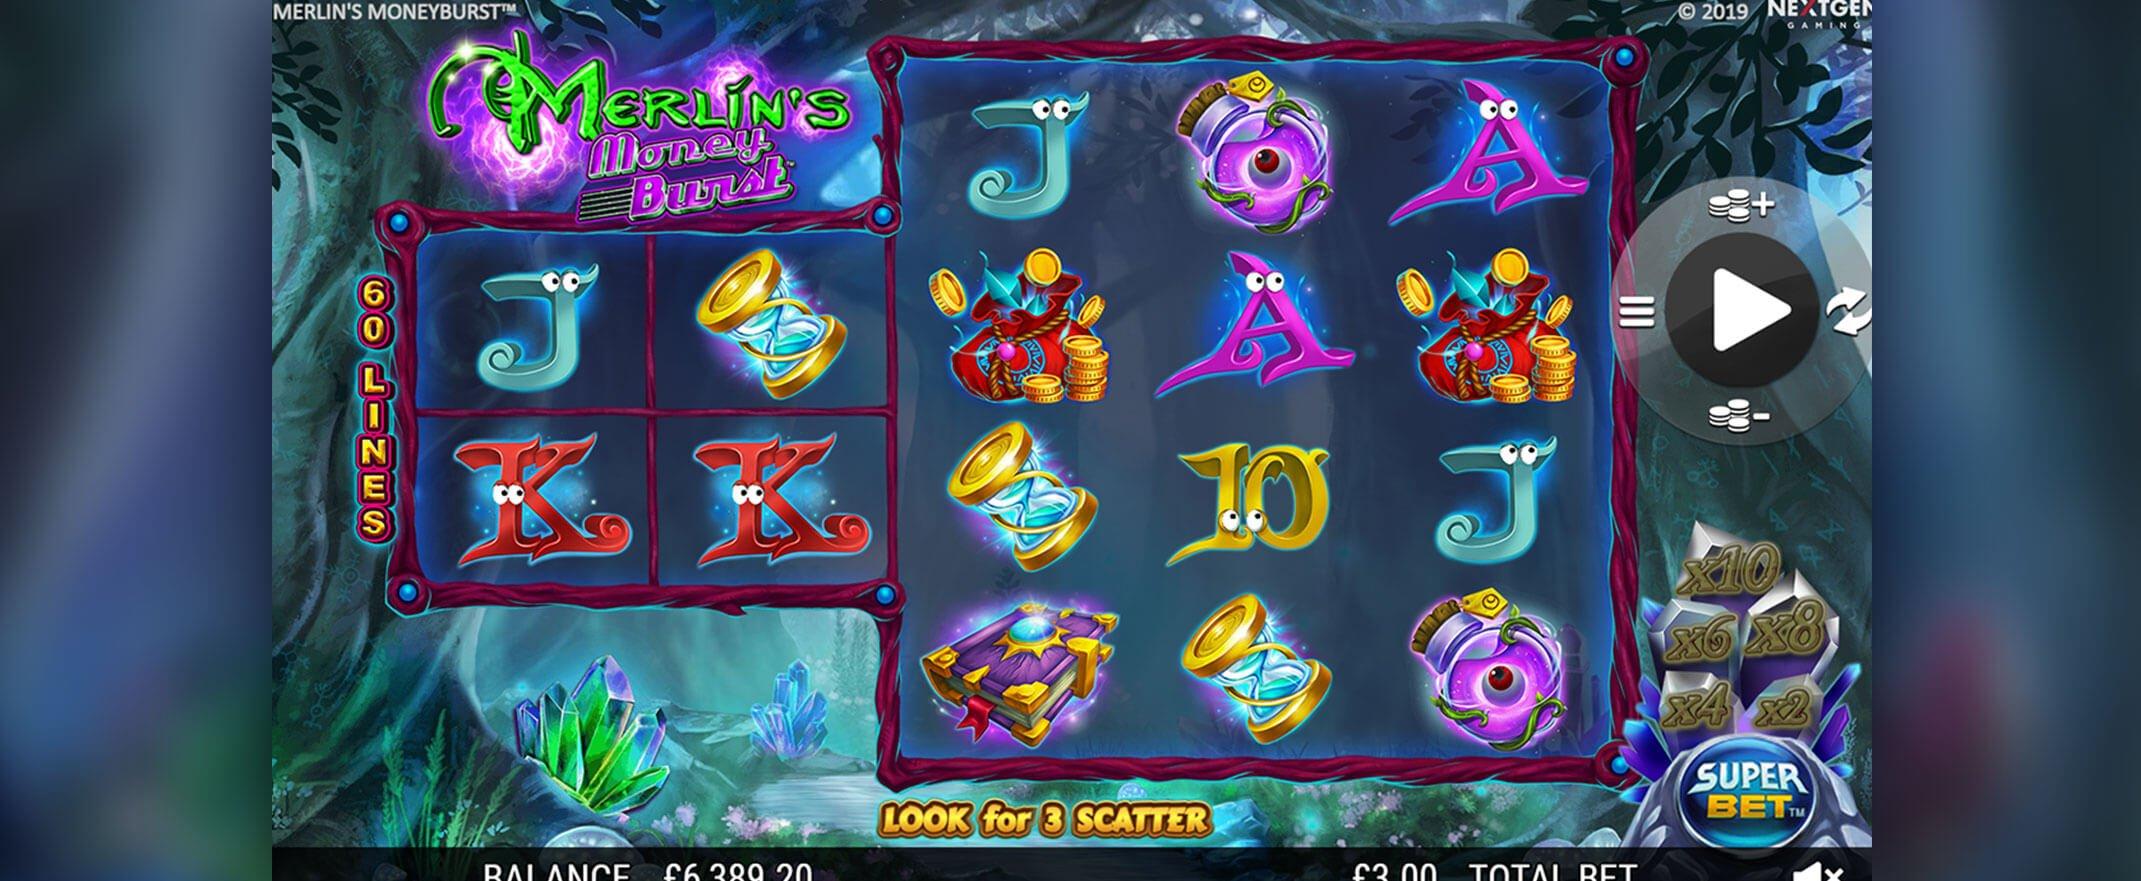 Merlins Money Burst Online Slot Features